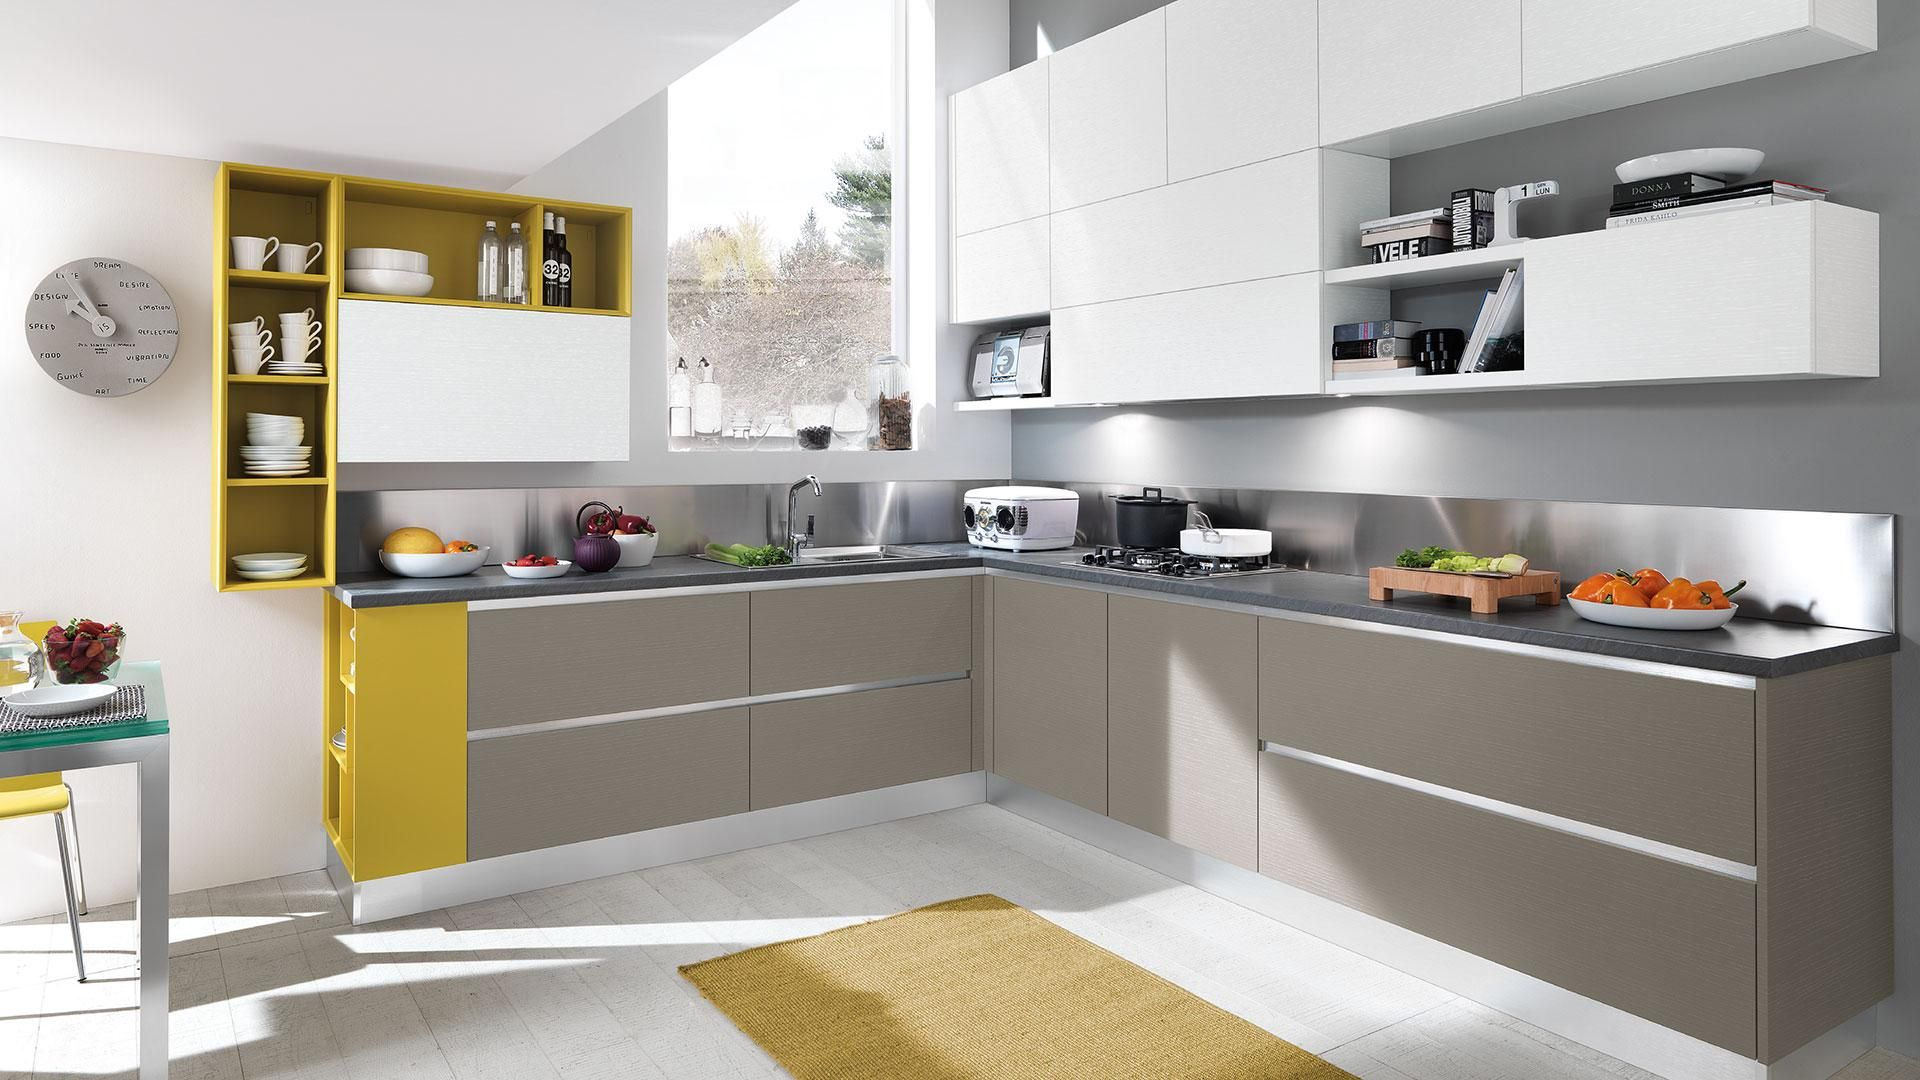 Essenza - Cucine Moderne - Cucine Lube | Cucina | Pinterest